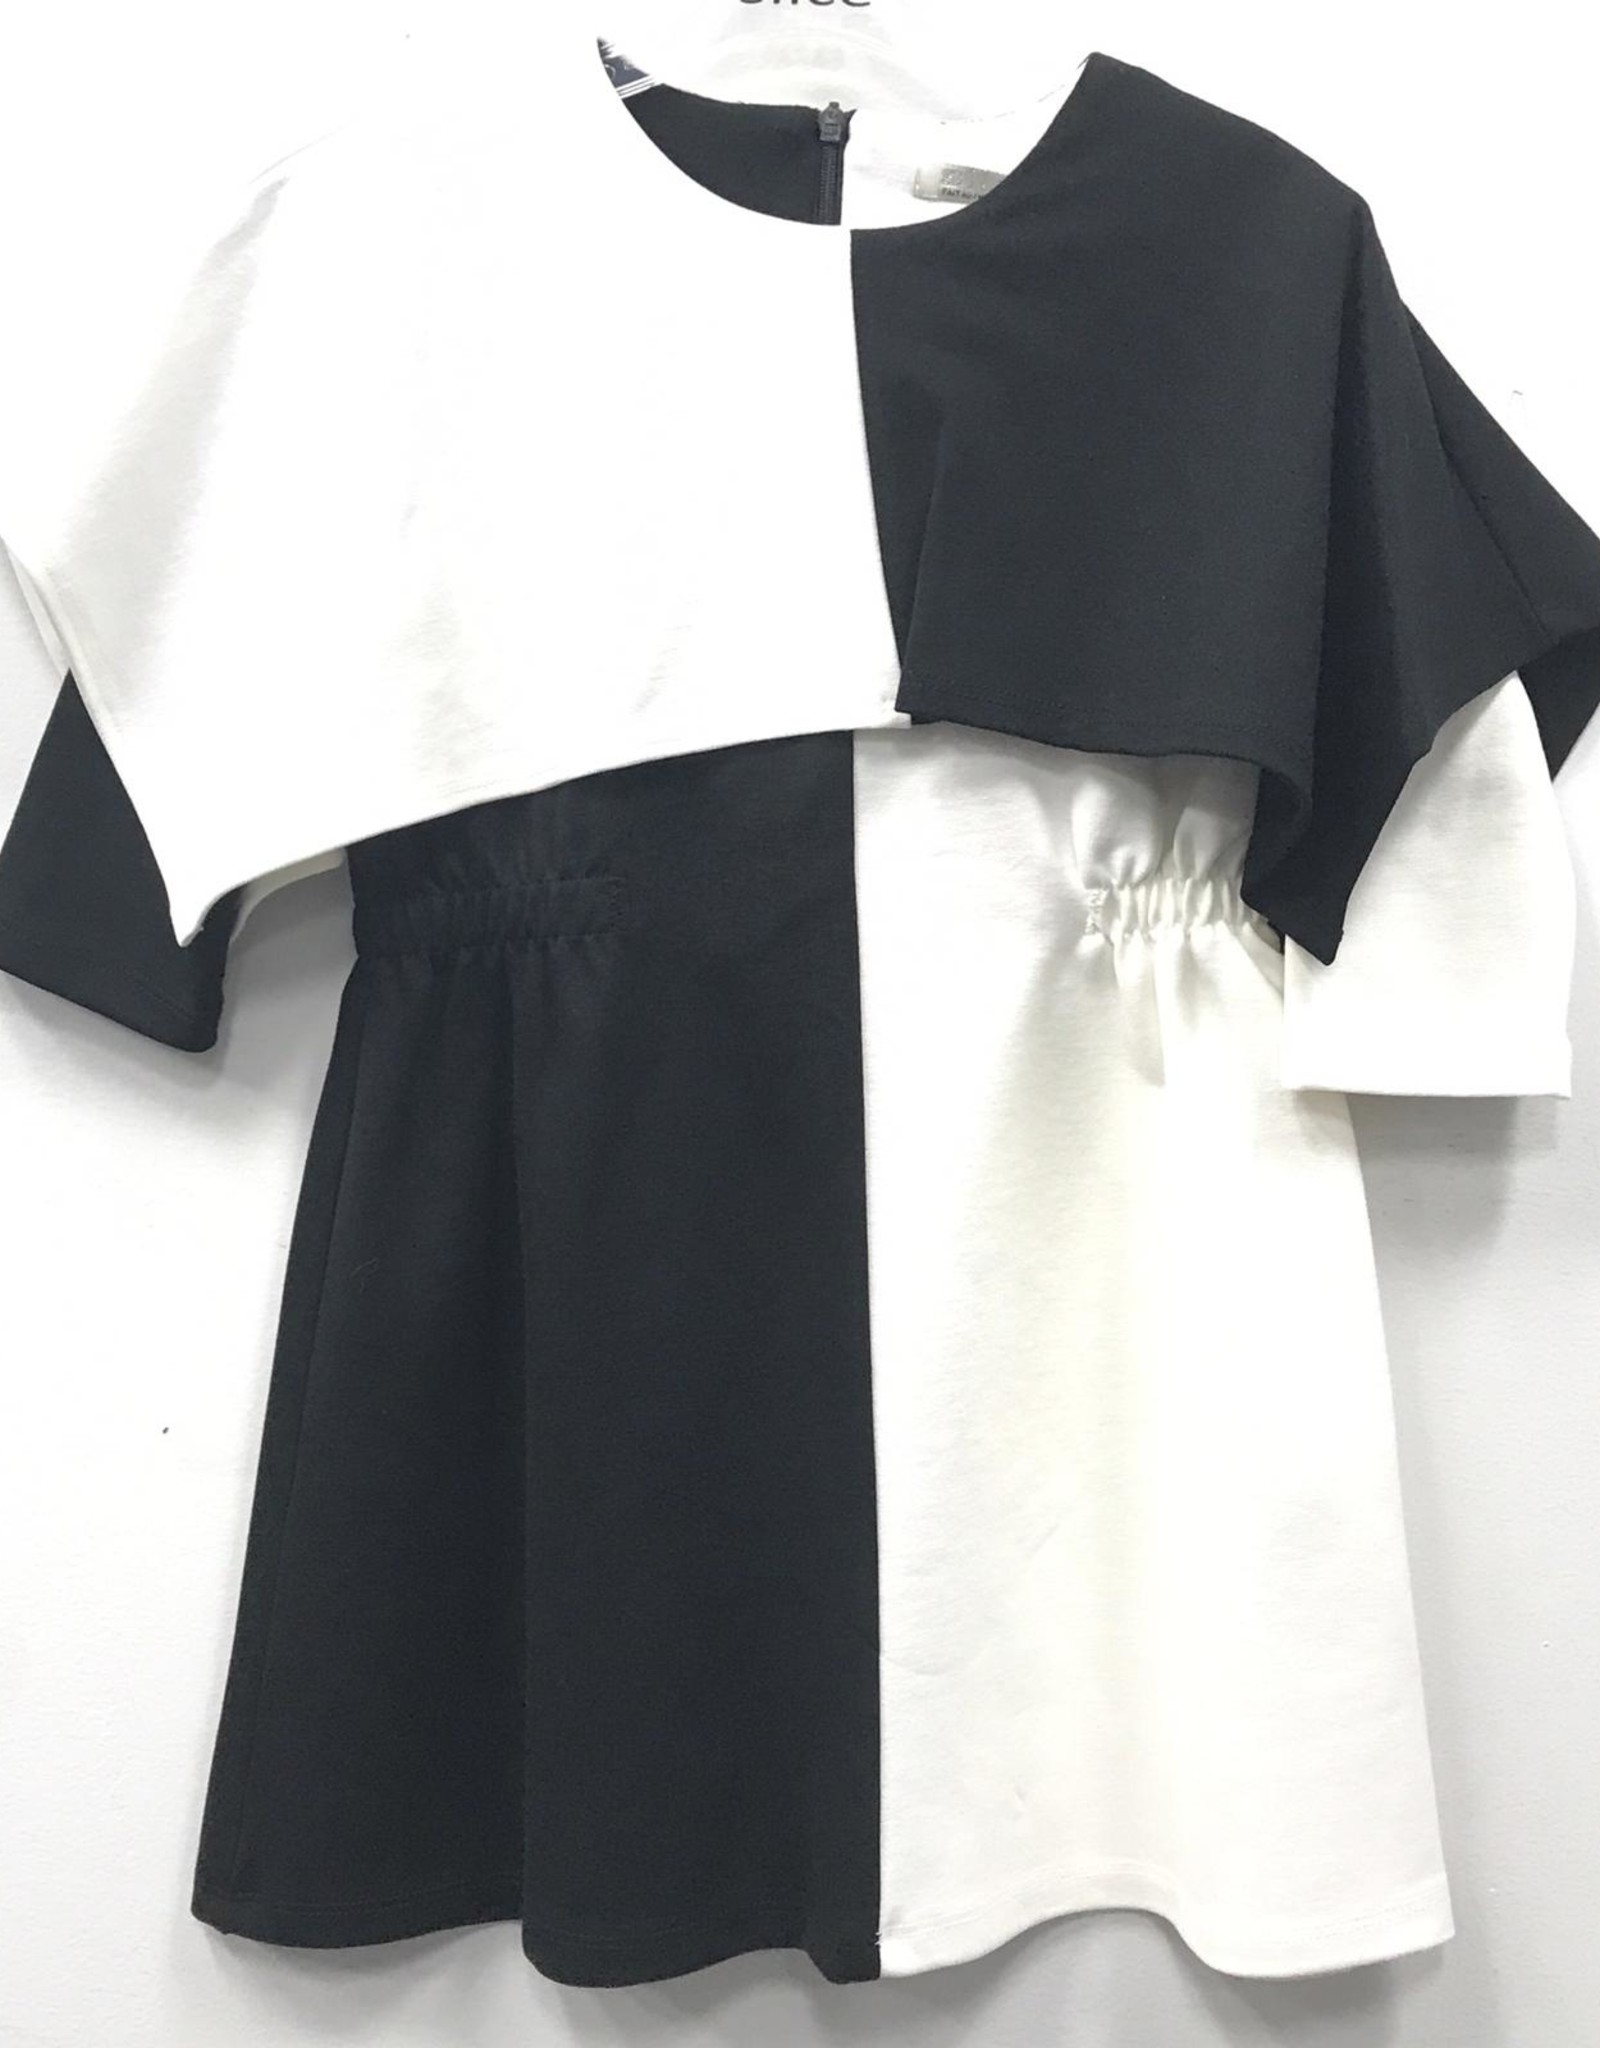 SLICE Slice Black/White Colorblock Dress with Cape